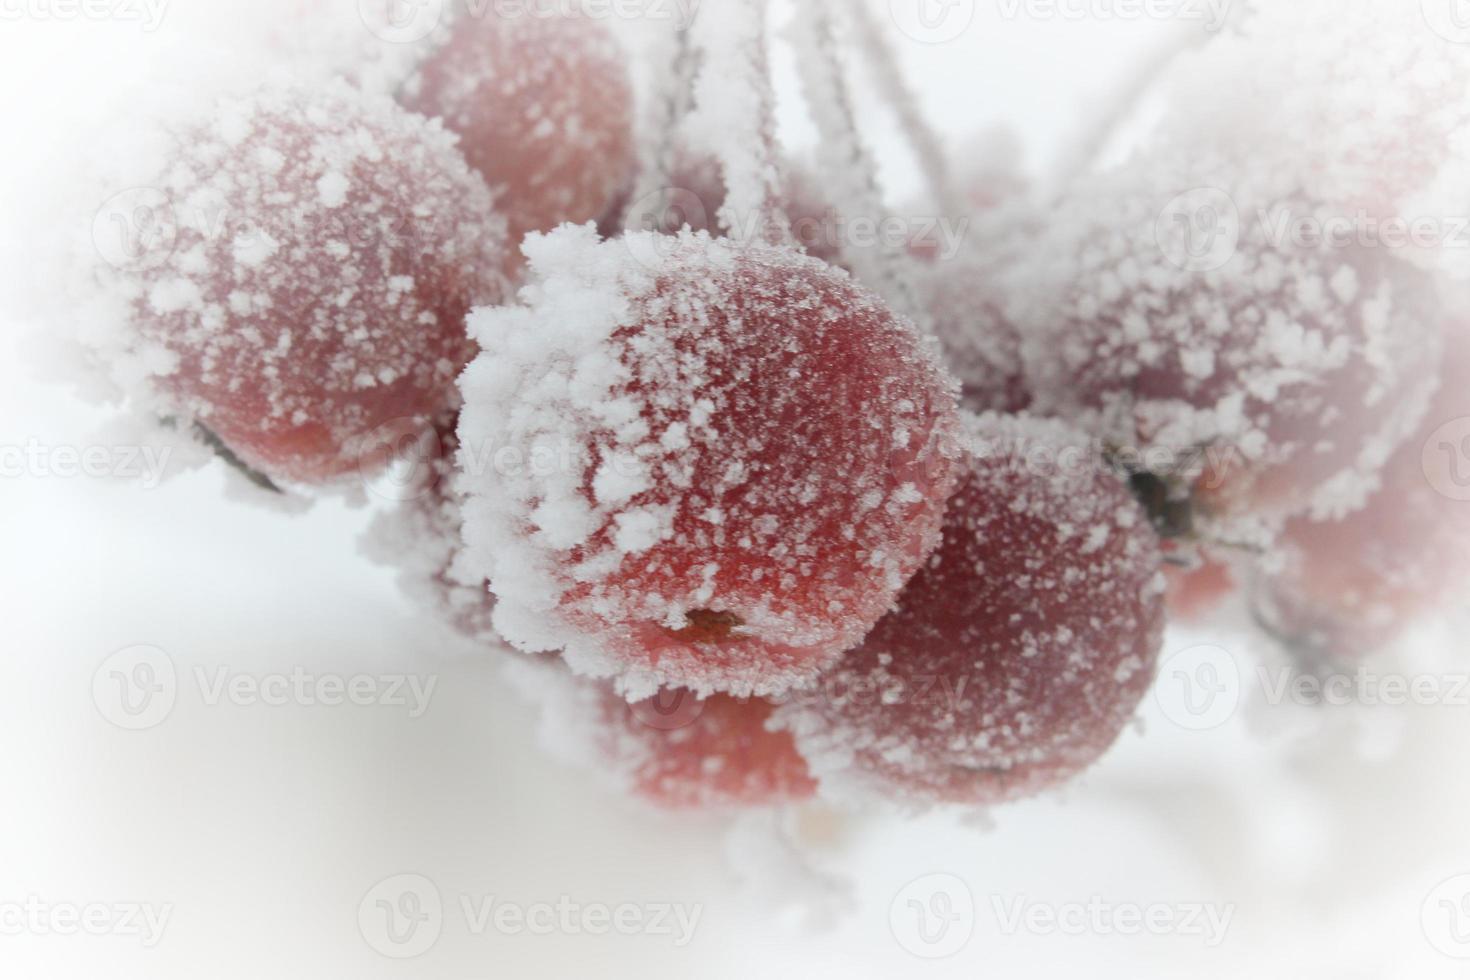 Red Crabapples in Winter photo